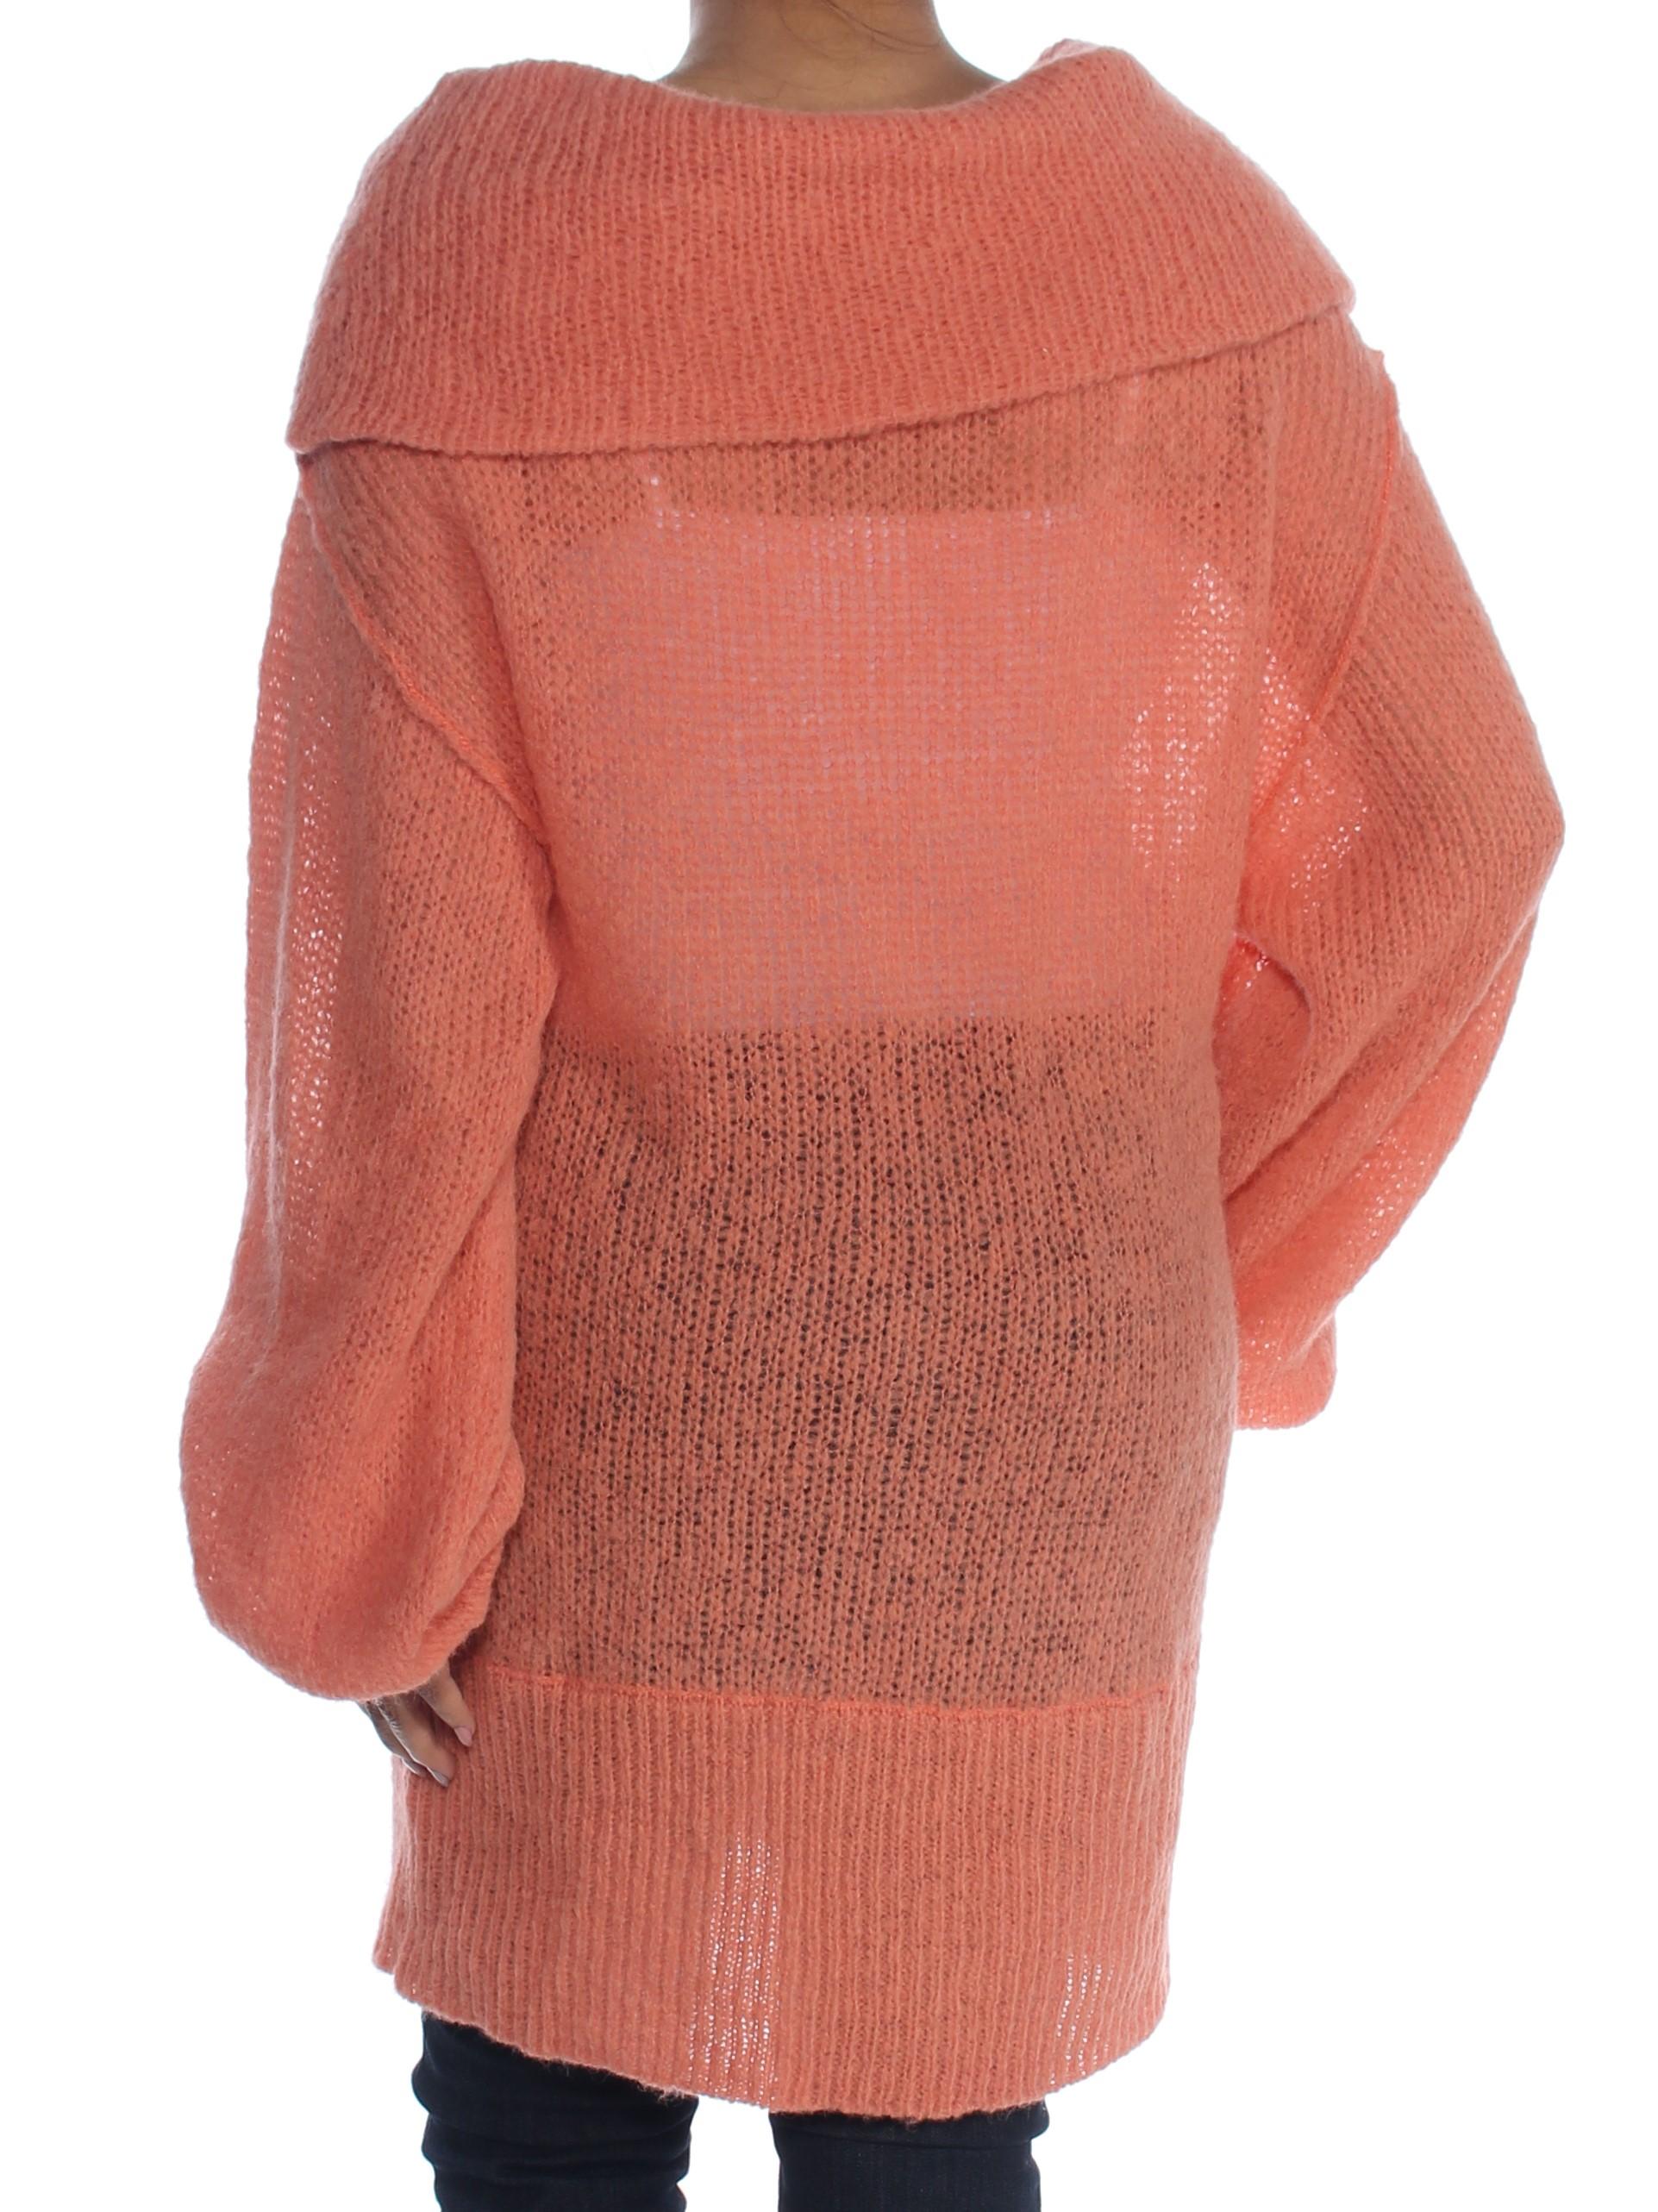 c81c5761640c FREE PEOPLE  148 Womens New 1346 Orange Long Sleeve Cowl Neck ...